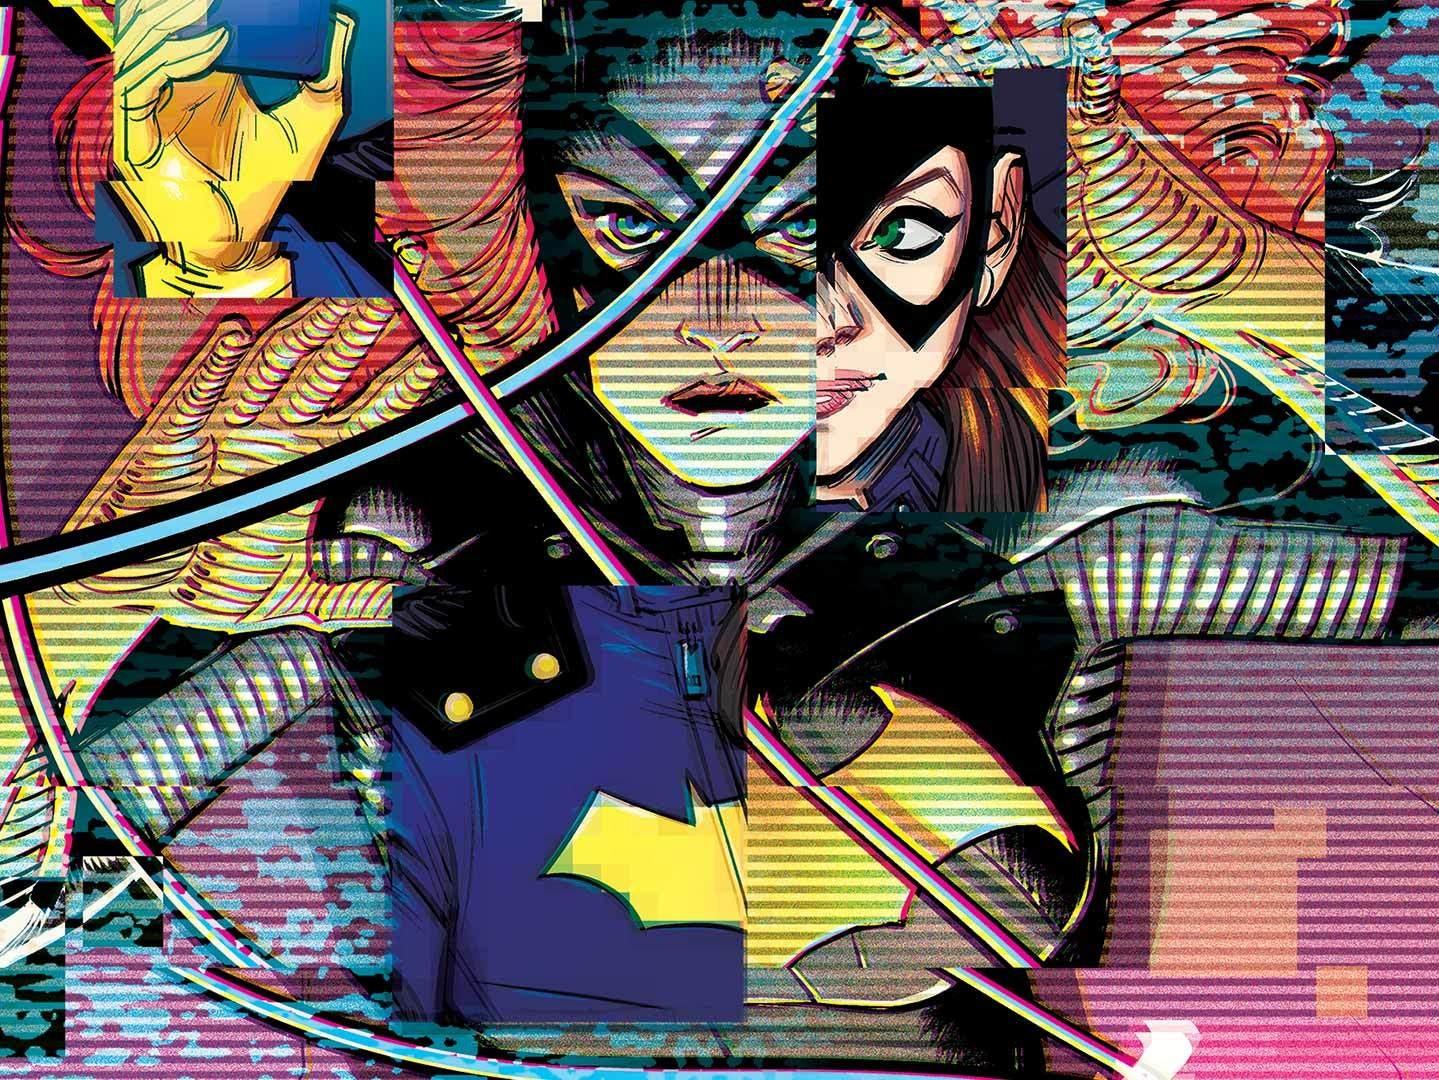 Batgirl's Apperance in the 'Harley Quinn' Movie Could Solve Film's Internet Problem